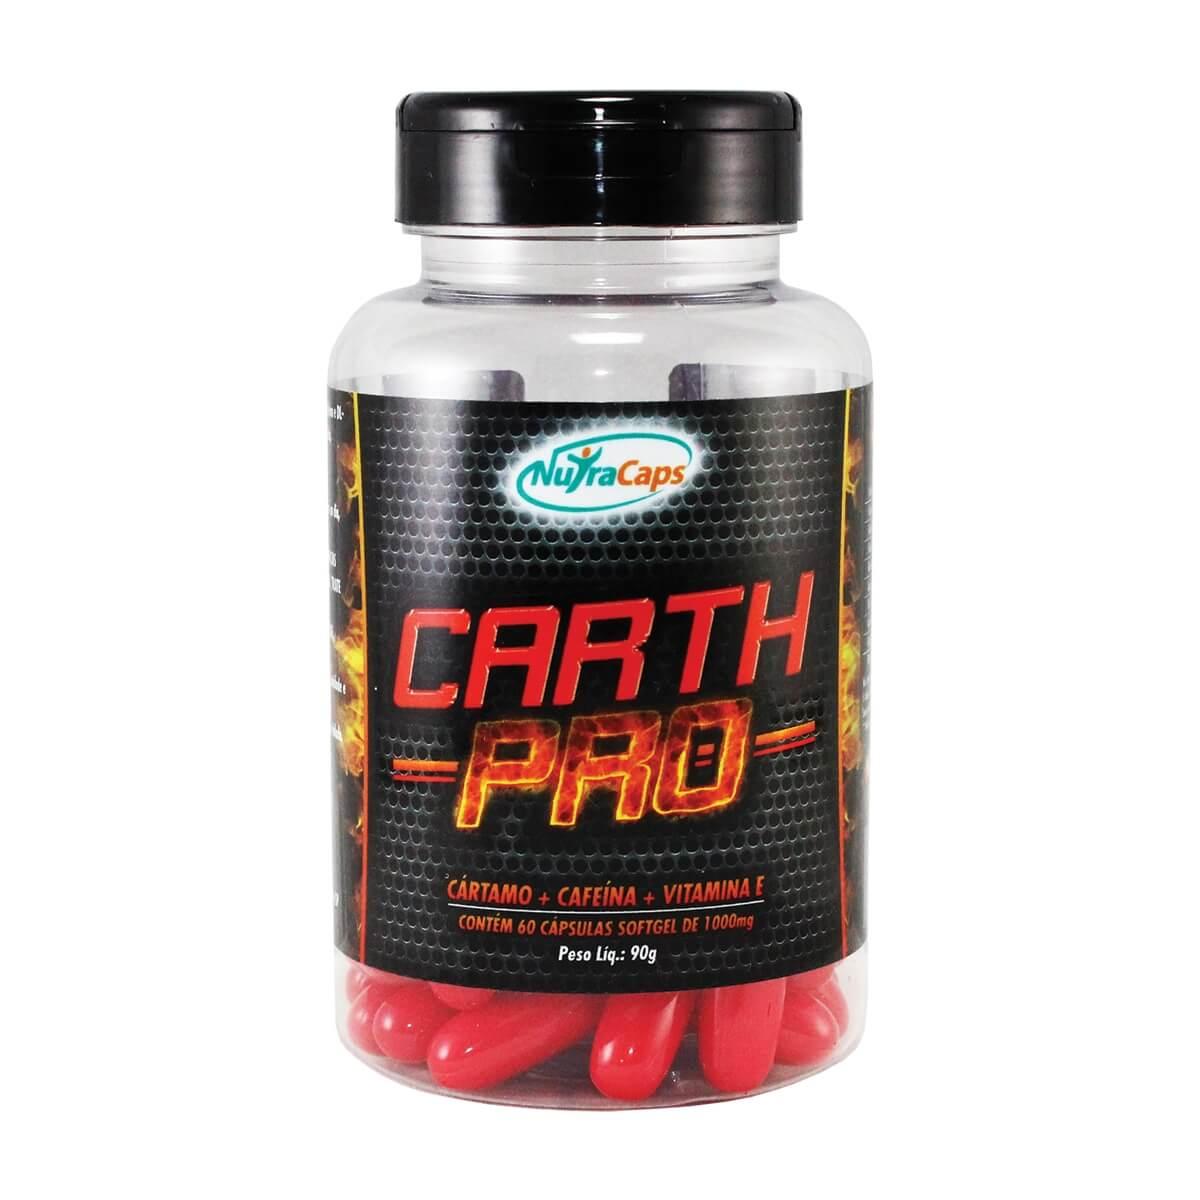 Carth Pro 1000mg NutraCaps - 60 caps